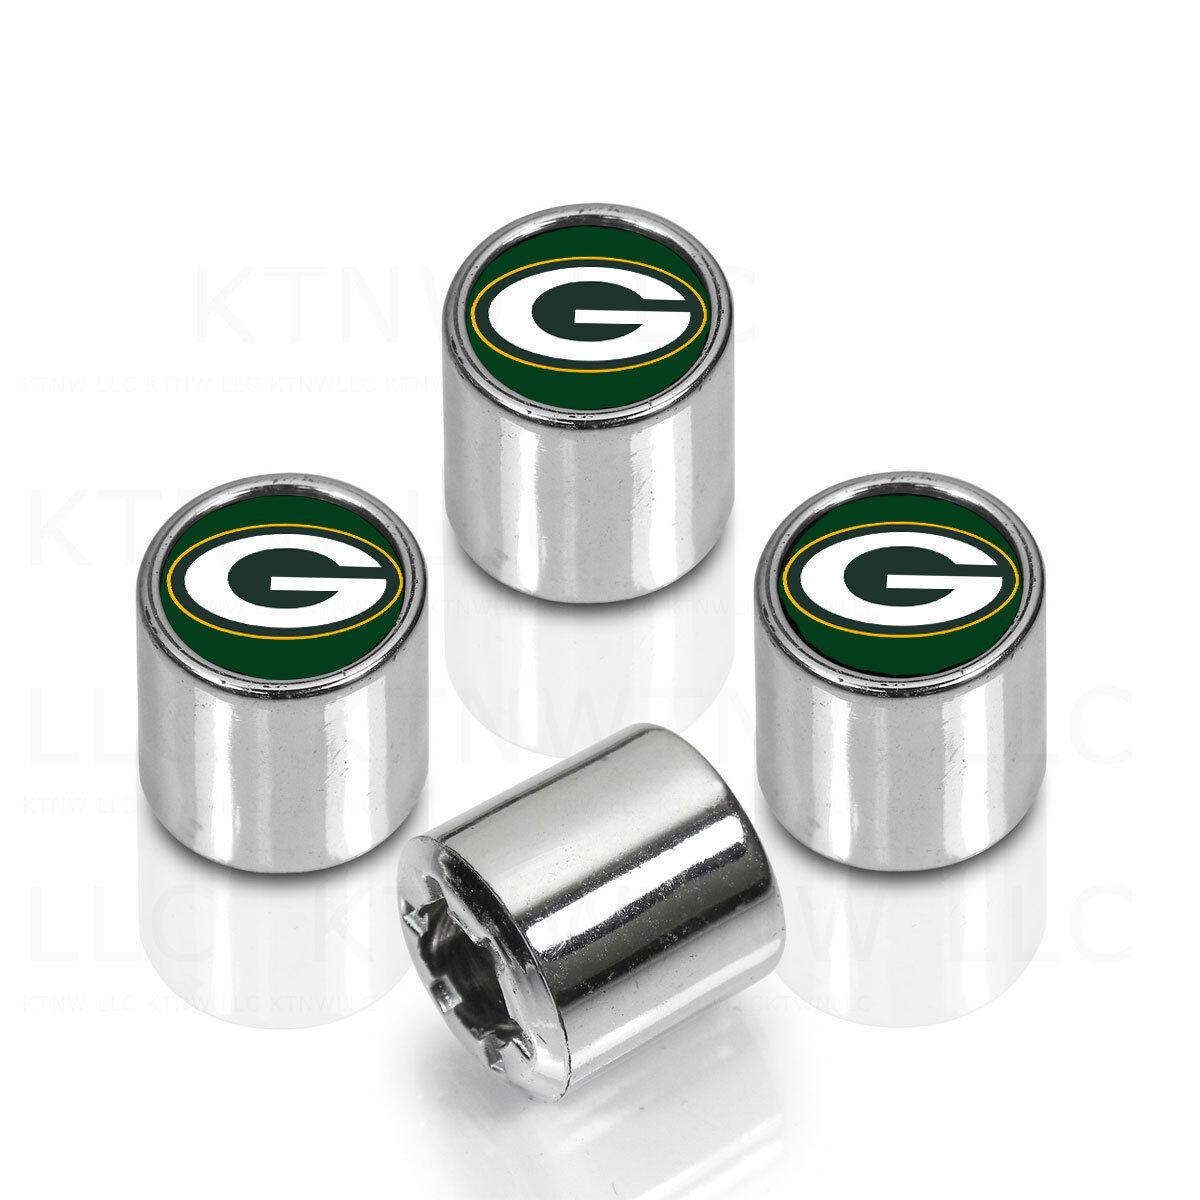 New NFL All Teams Car Truck SUV Van Plastic Chrome Finish Tire Valve Stem Caps